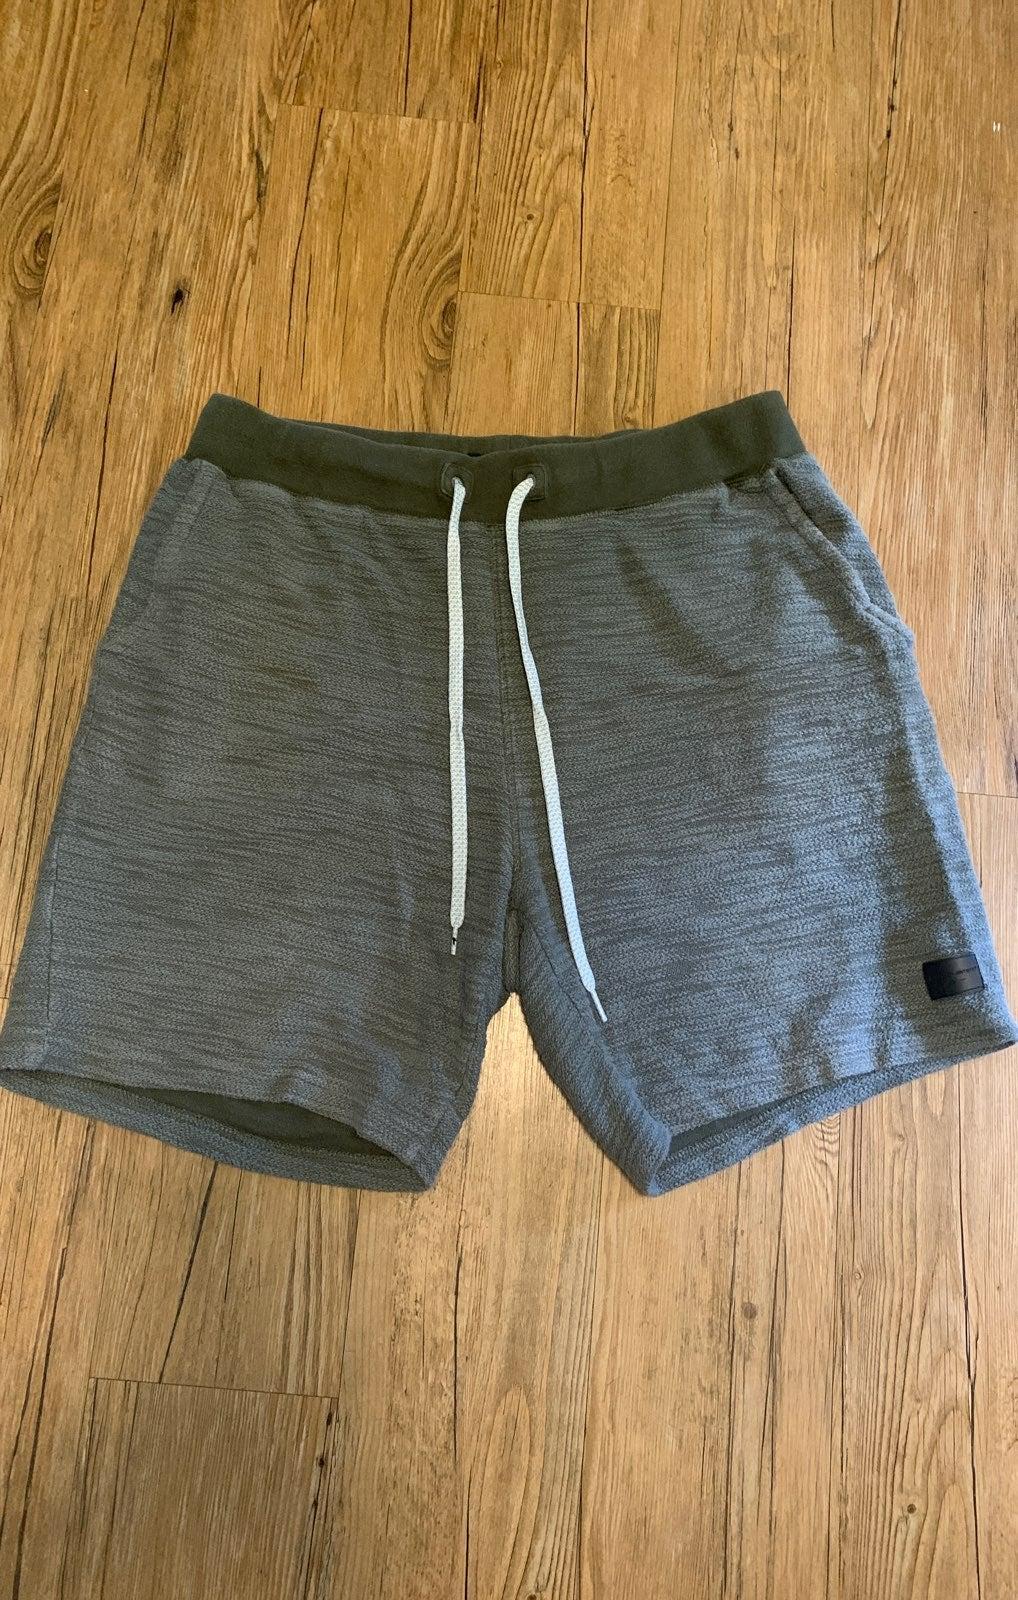 sweat shorts / slides bundle